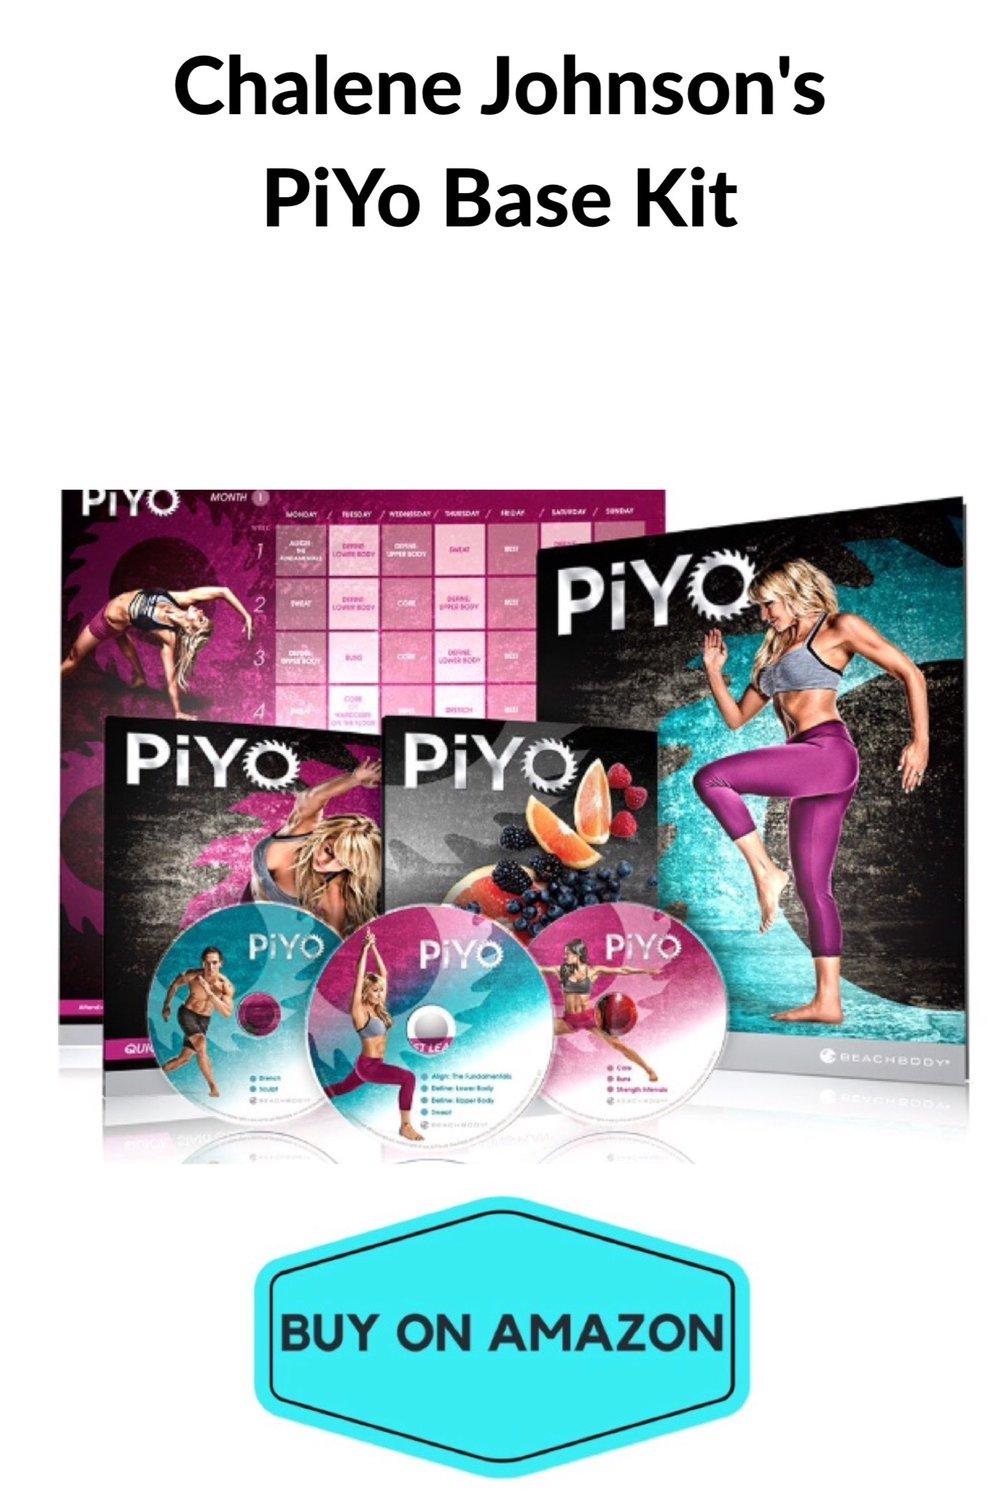 Chalene Johnson's PiYo Base Kit